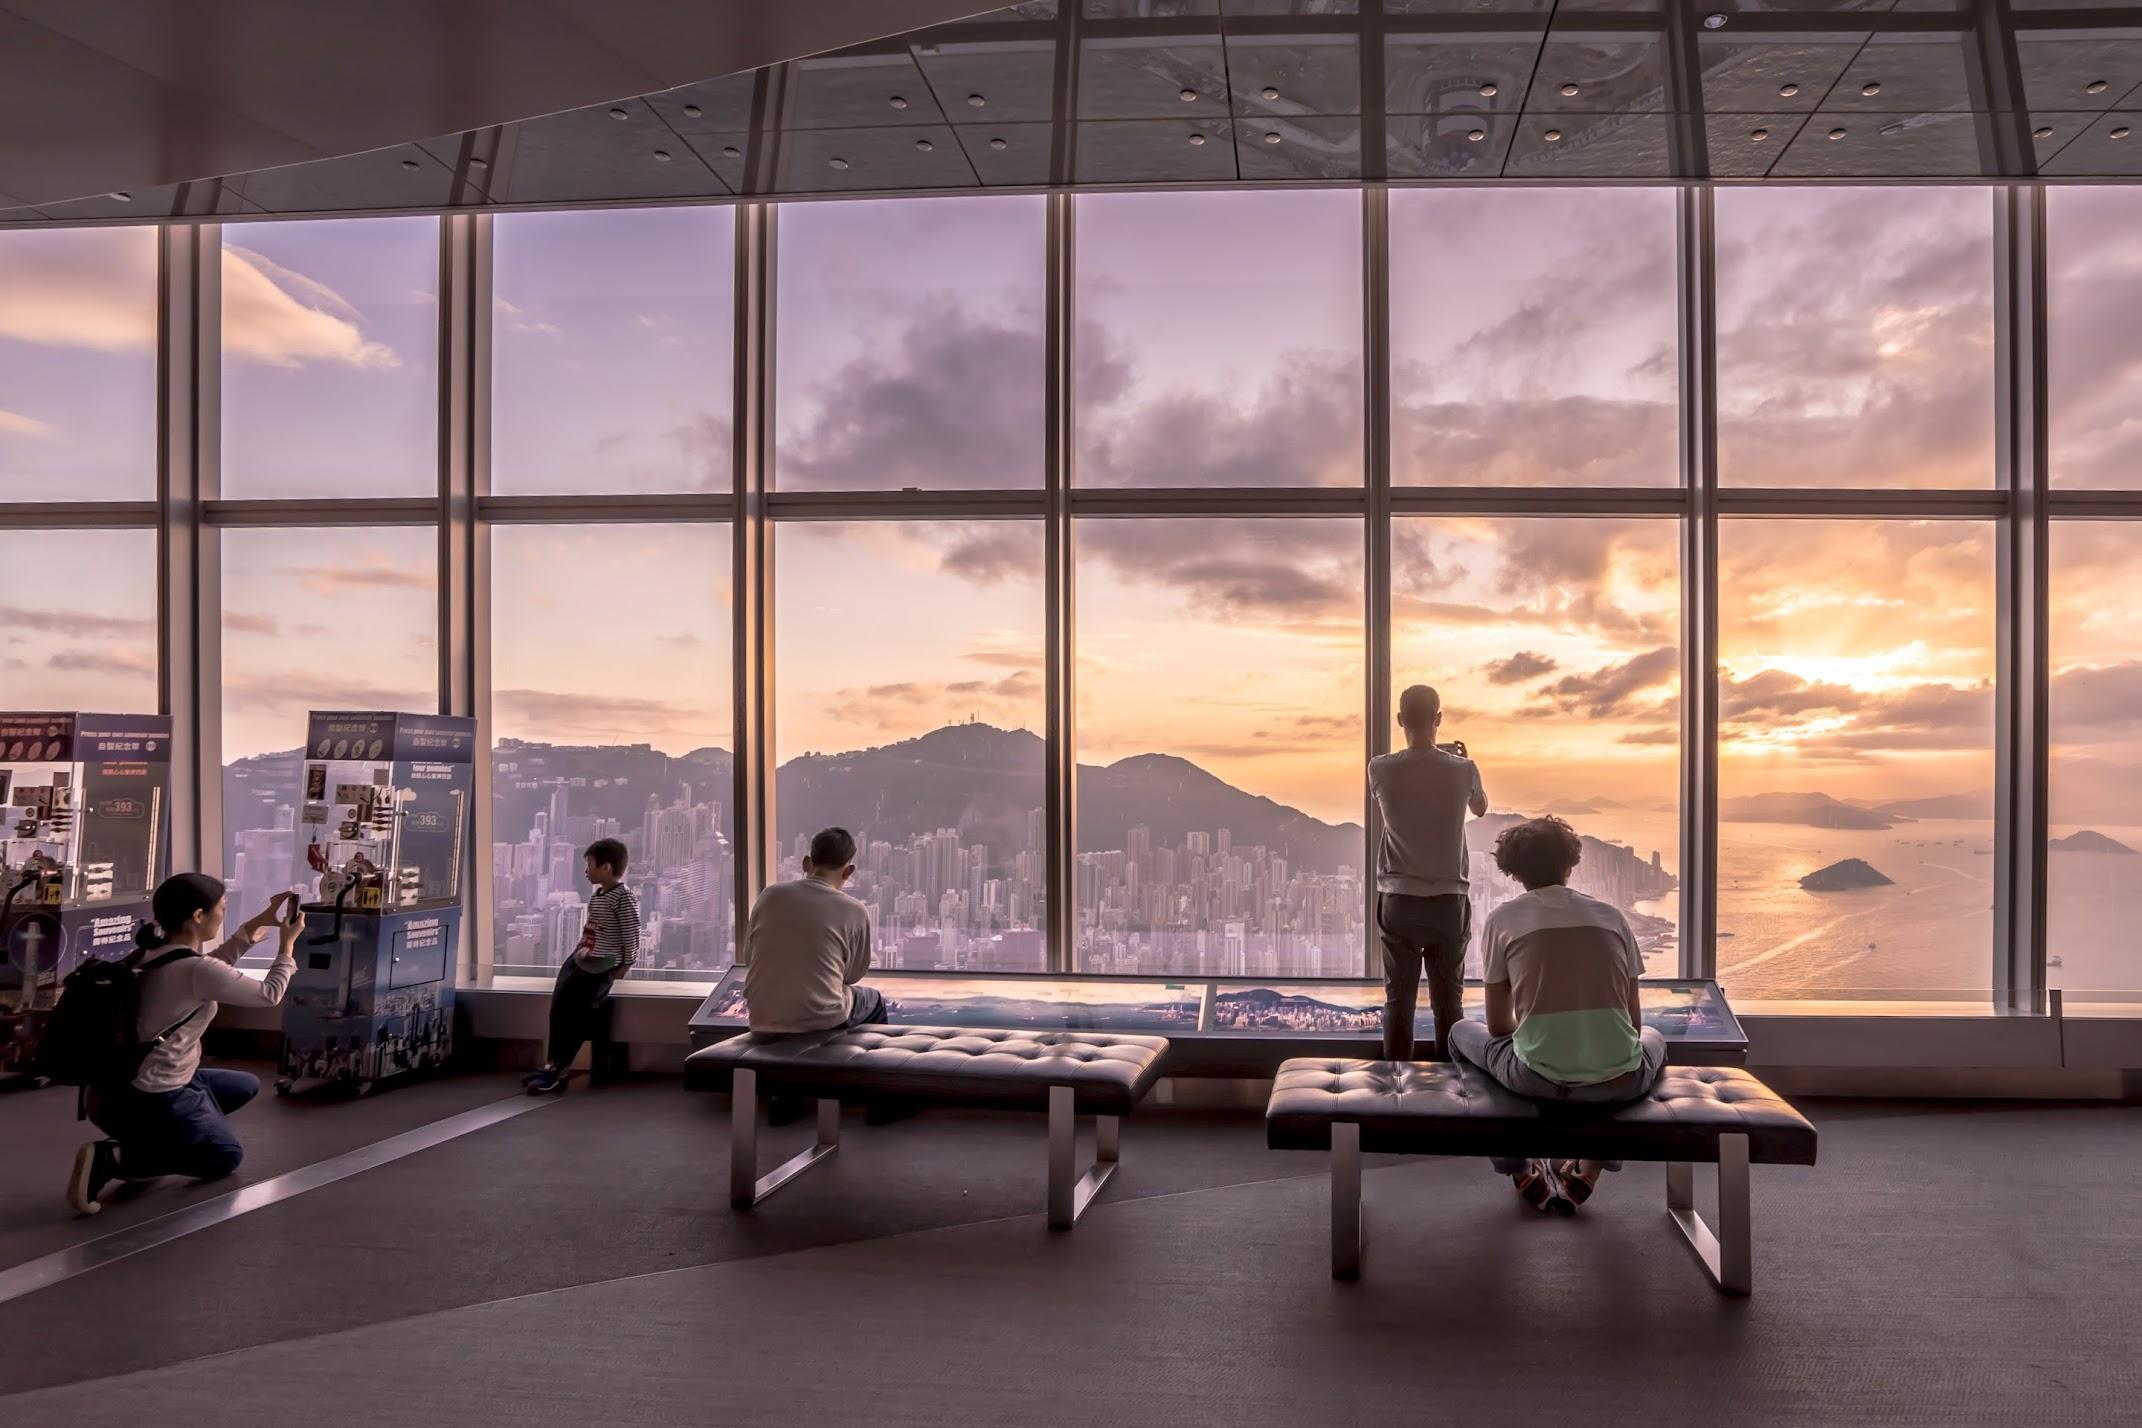 Hong Kong sky100 (天際100) evening2